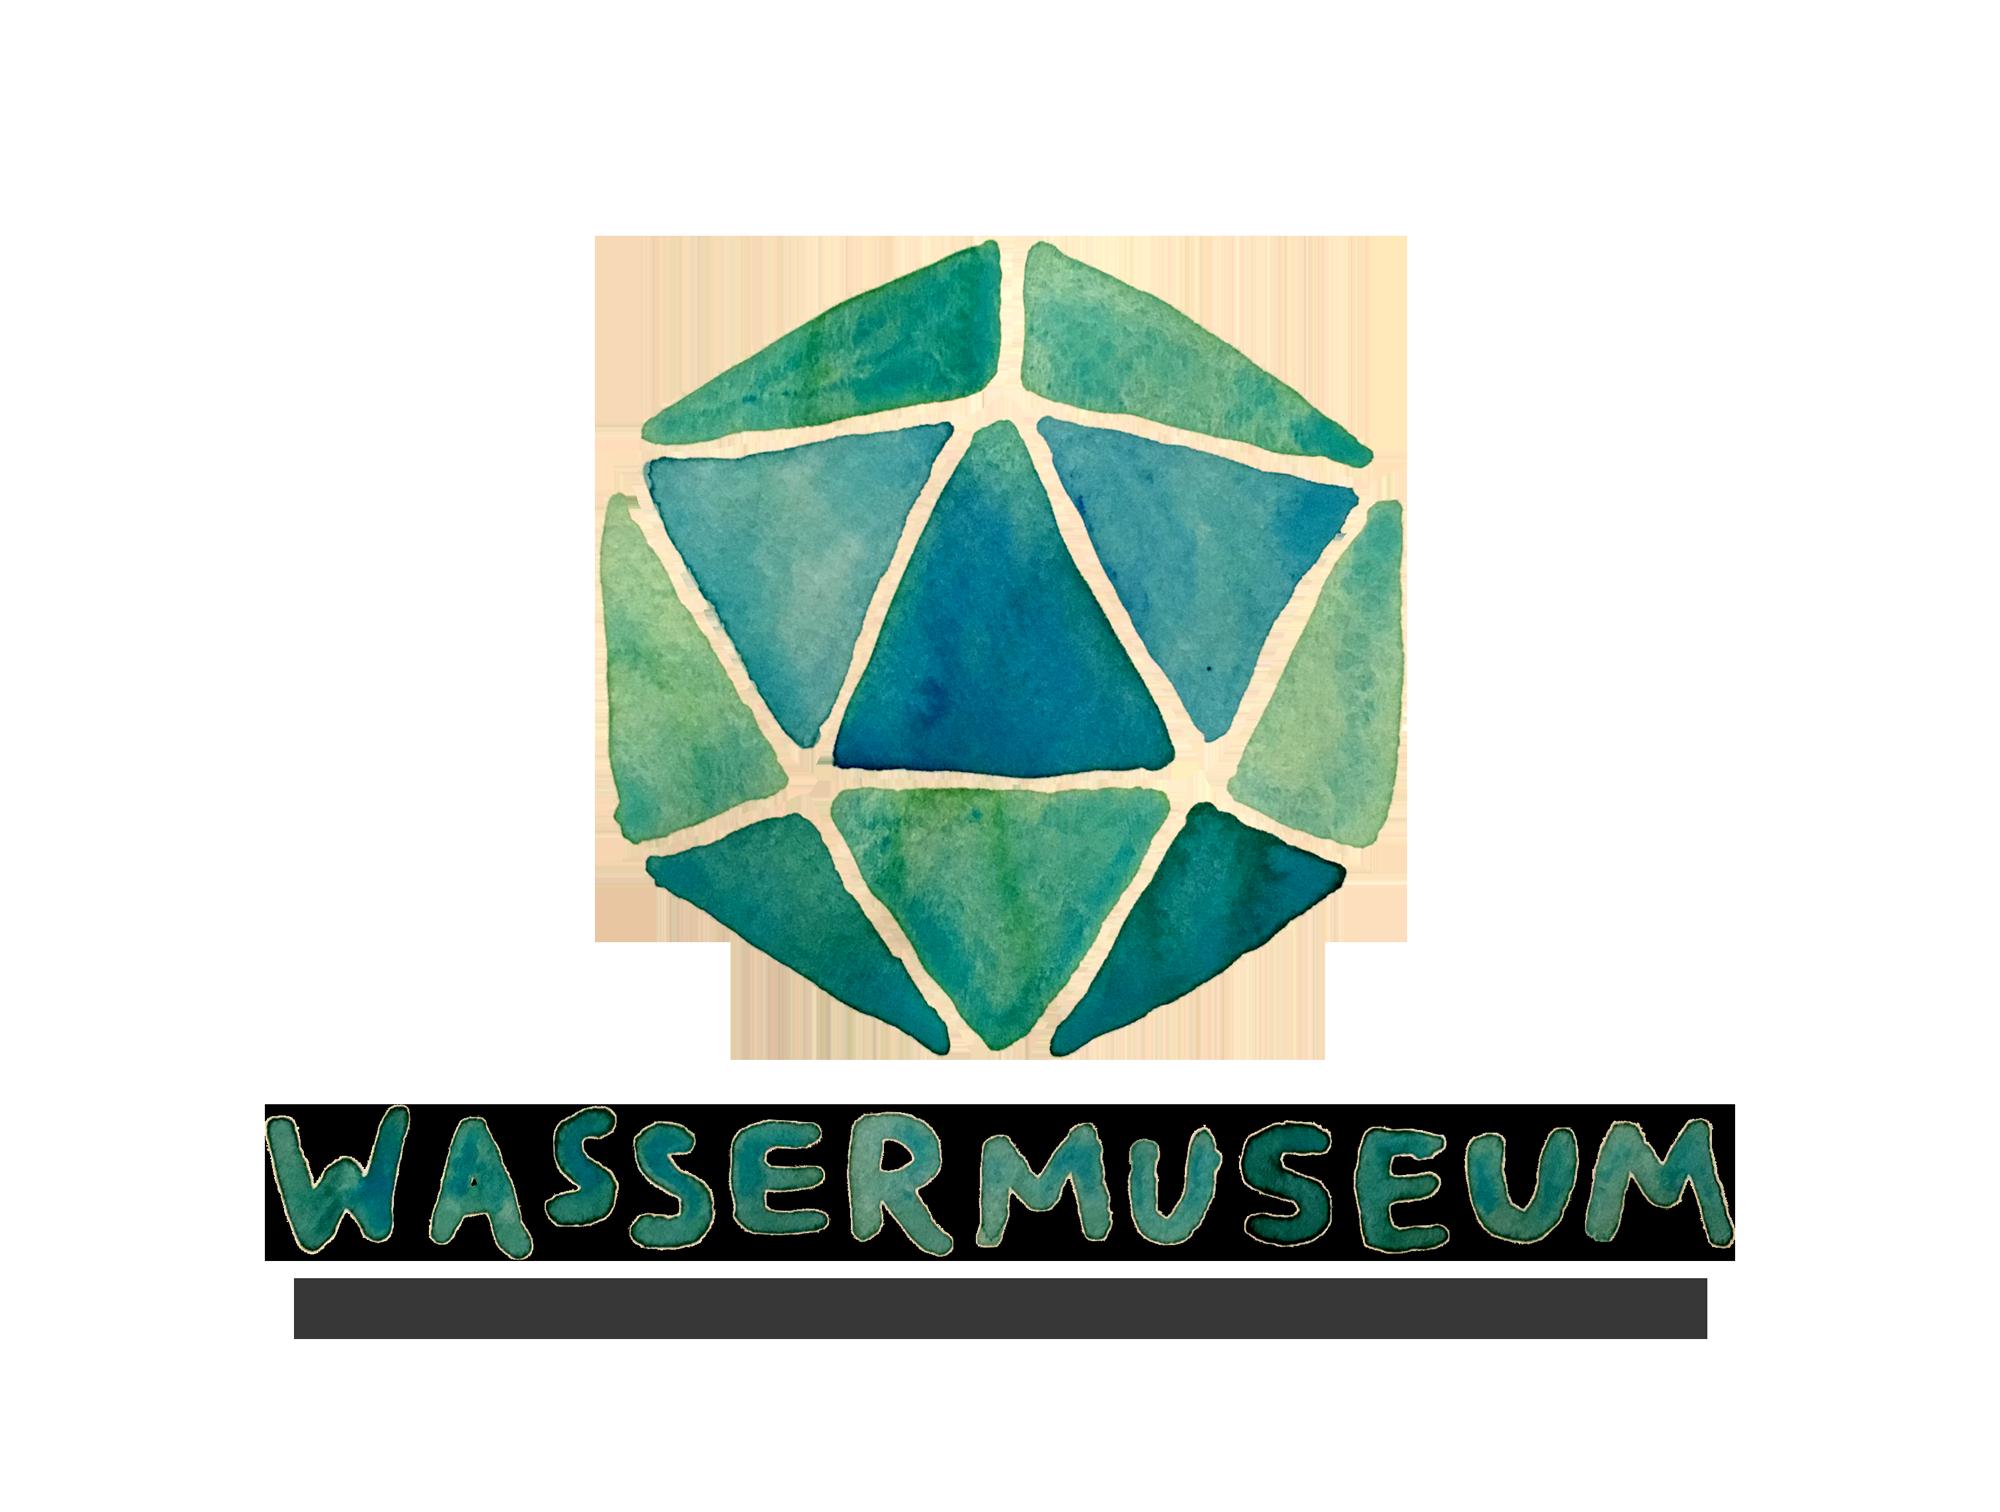 Wassermuseum